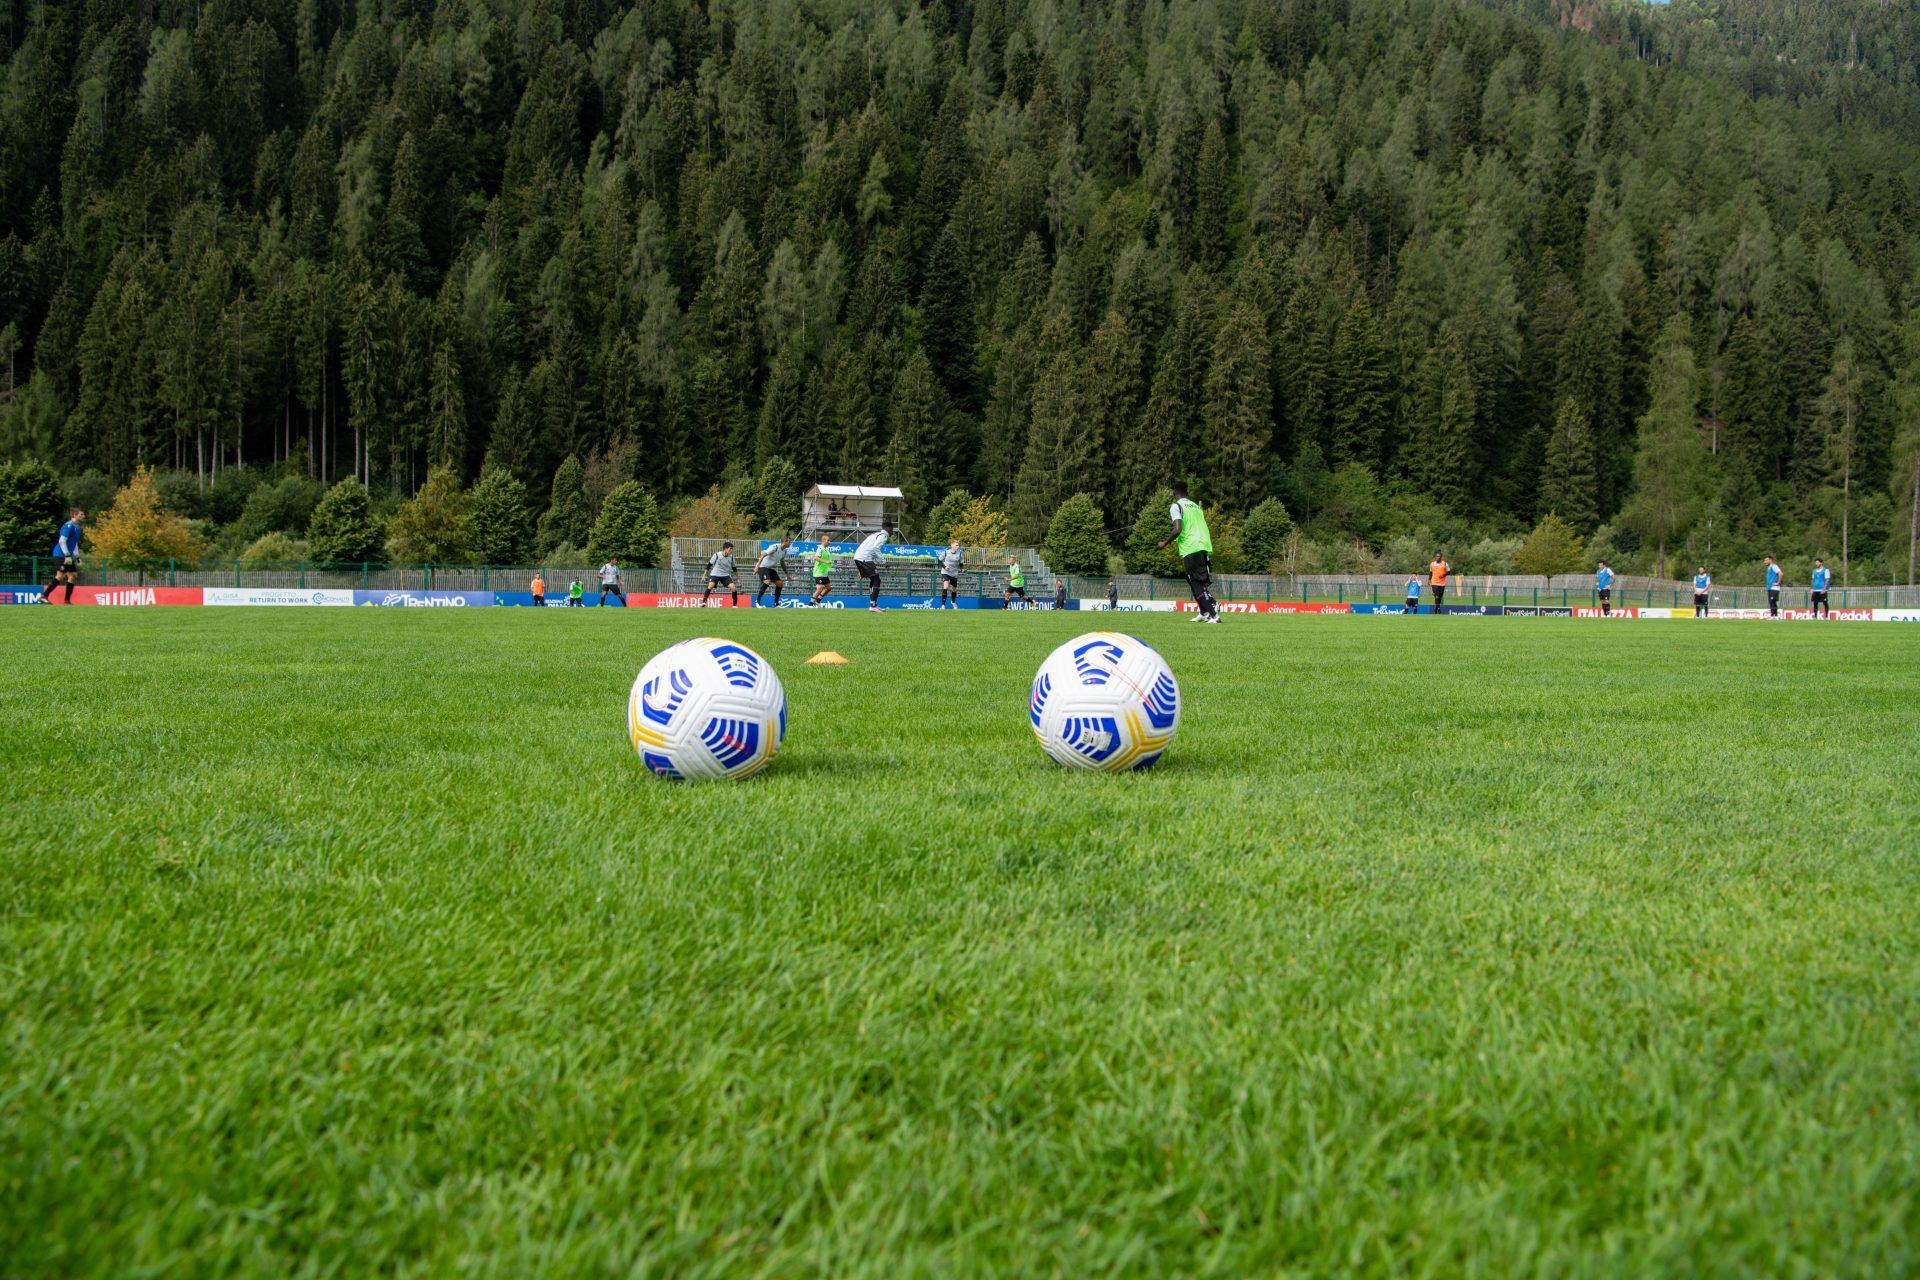 Radio Pinzolo weekly - Tomorrow friendly match against Feralpisalò at 3:30 p.m.